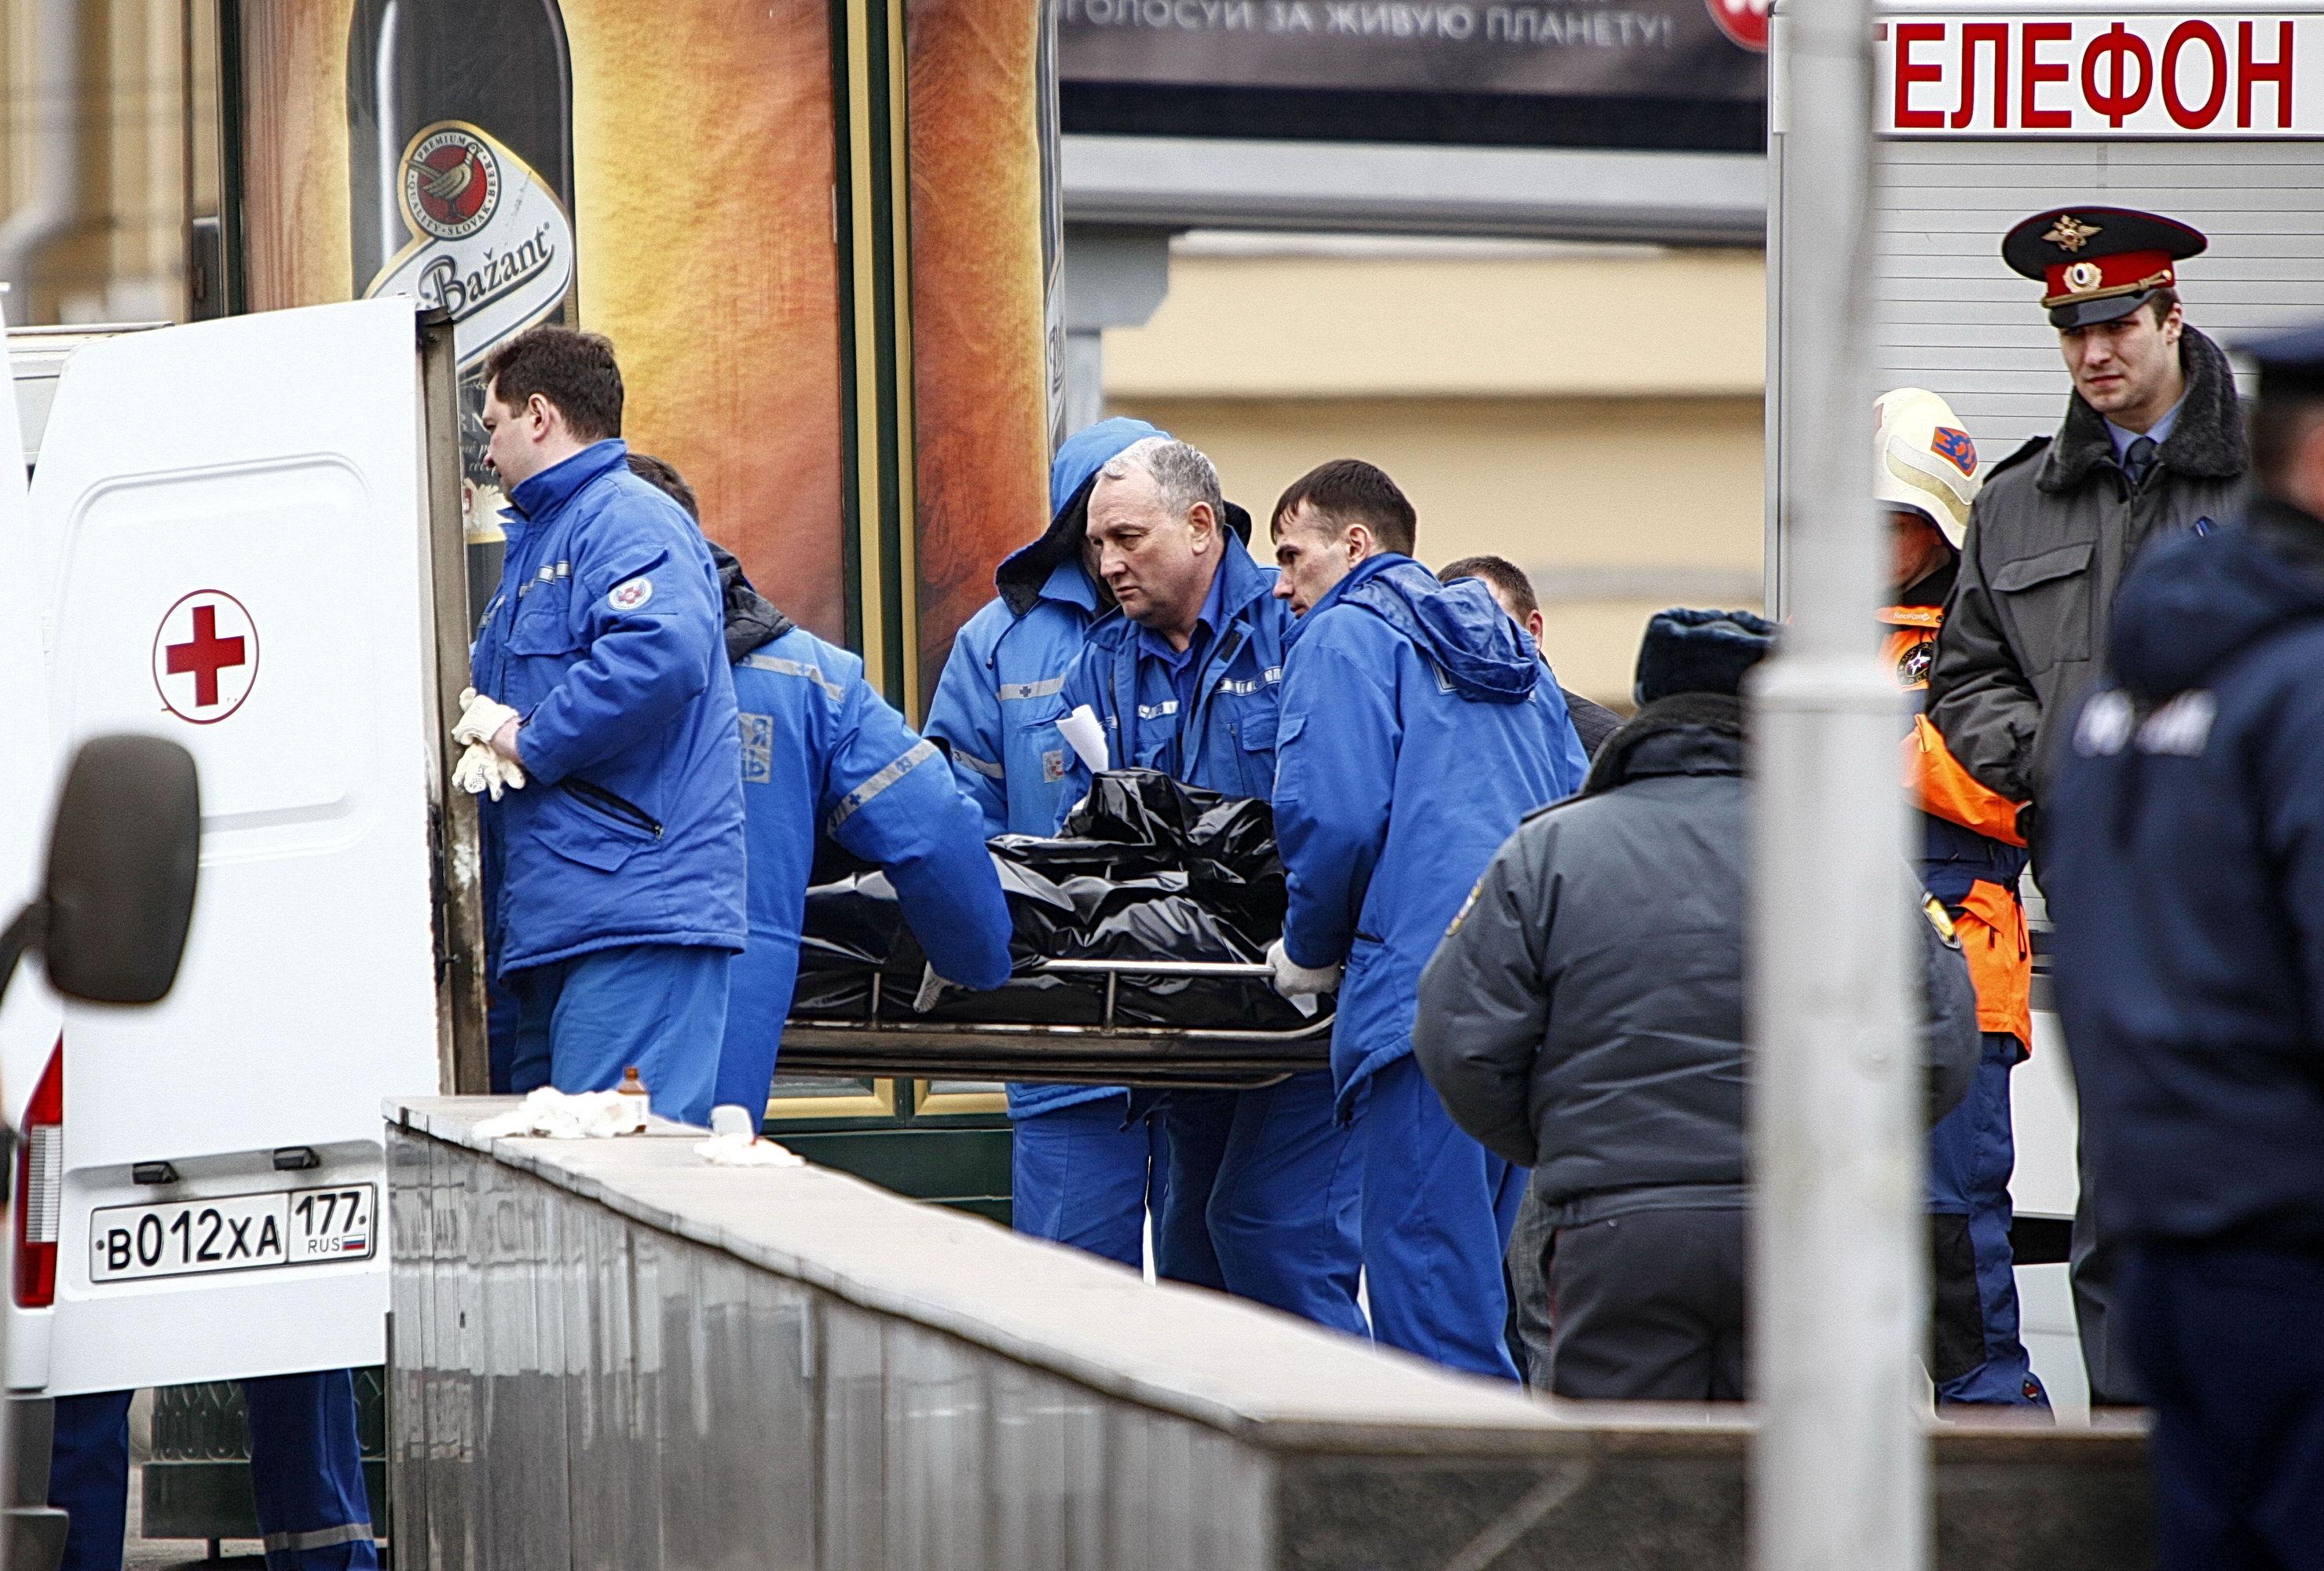 Работа спасателей у станции метро Лубянка